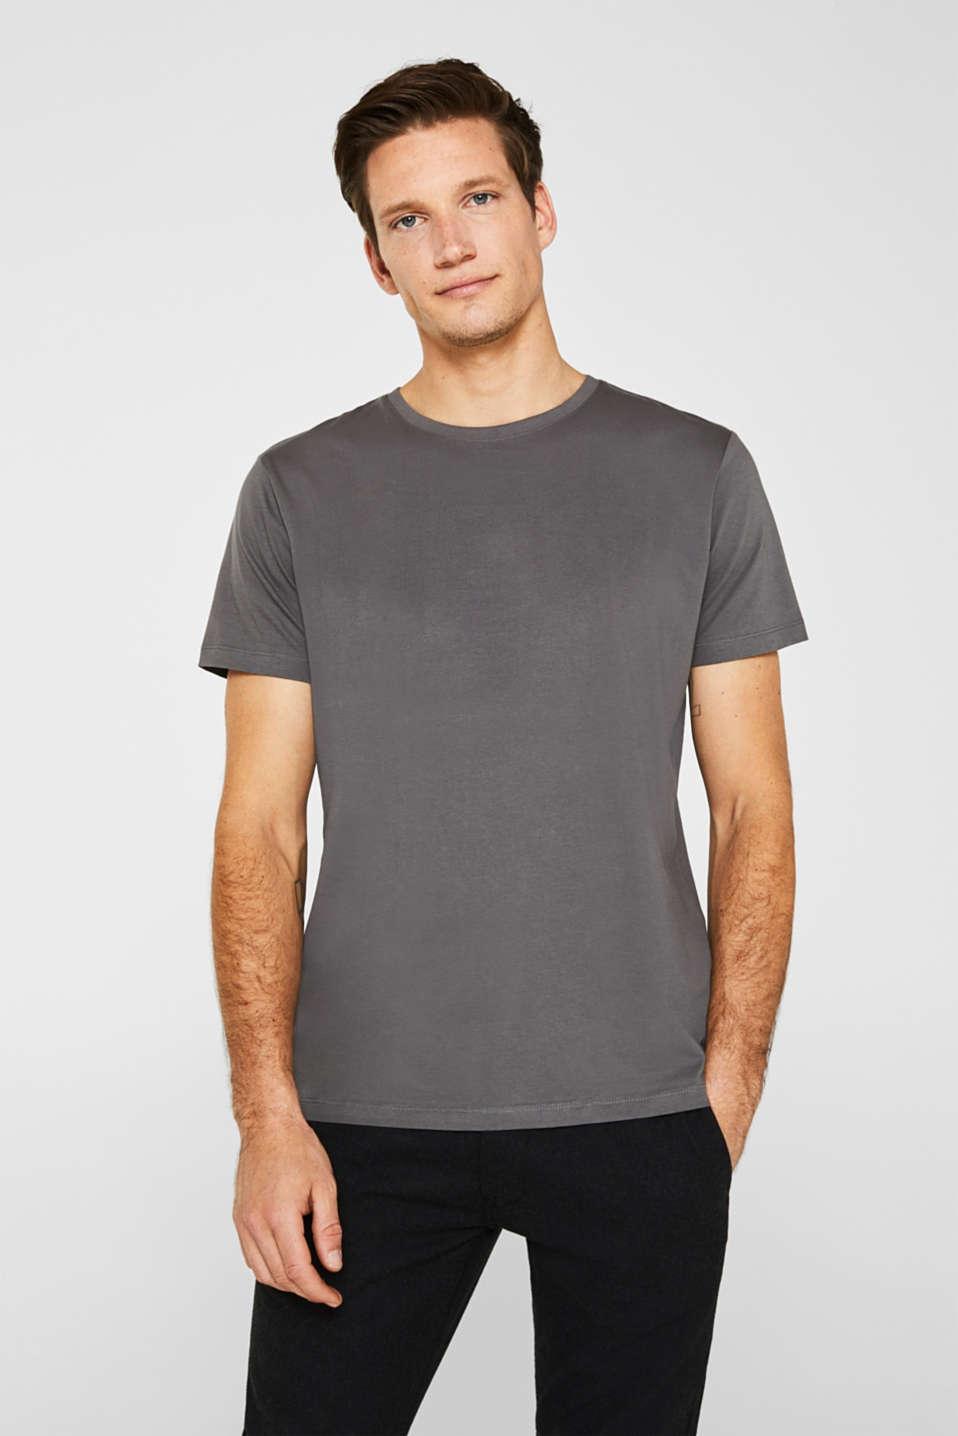 Jersey T-shirt in 100% cotton, DARK GREY, detail image number 0